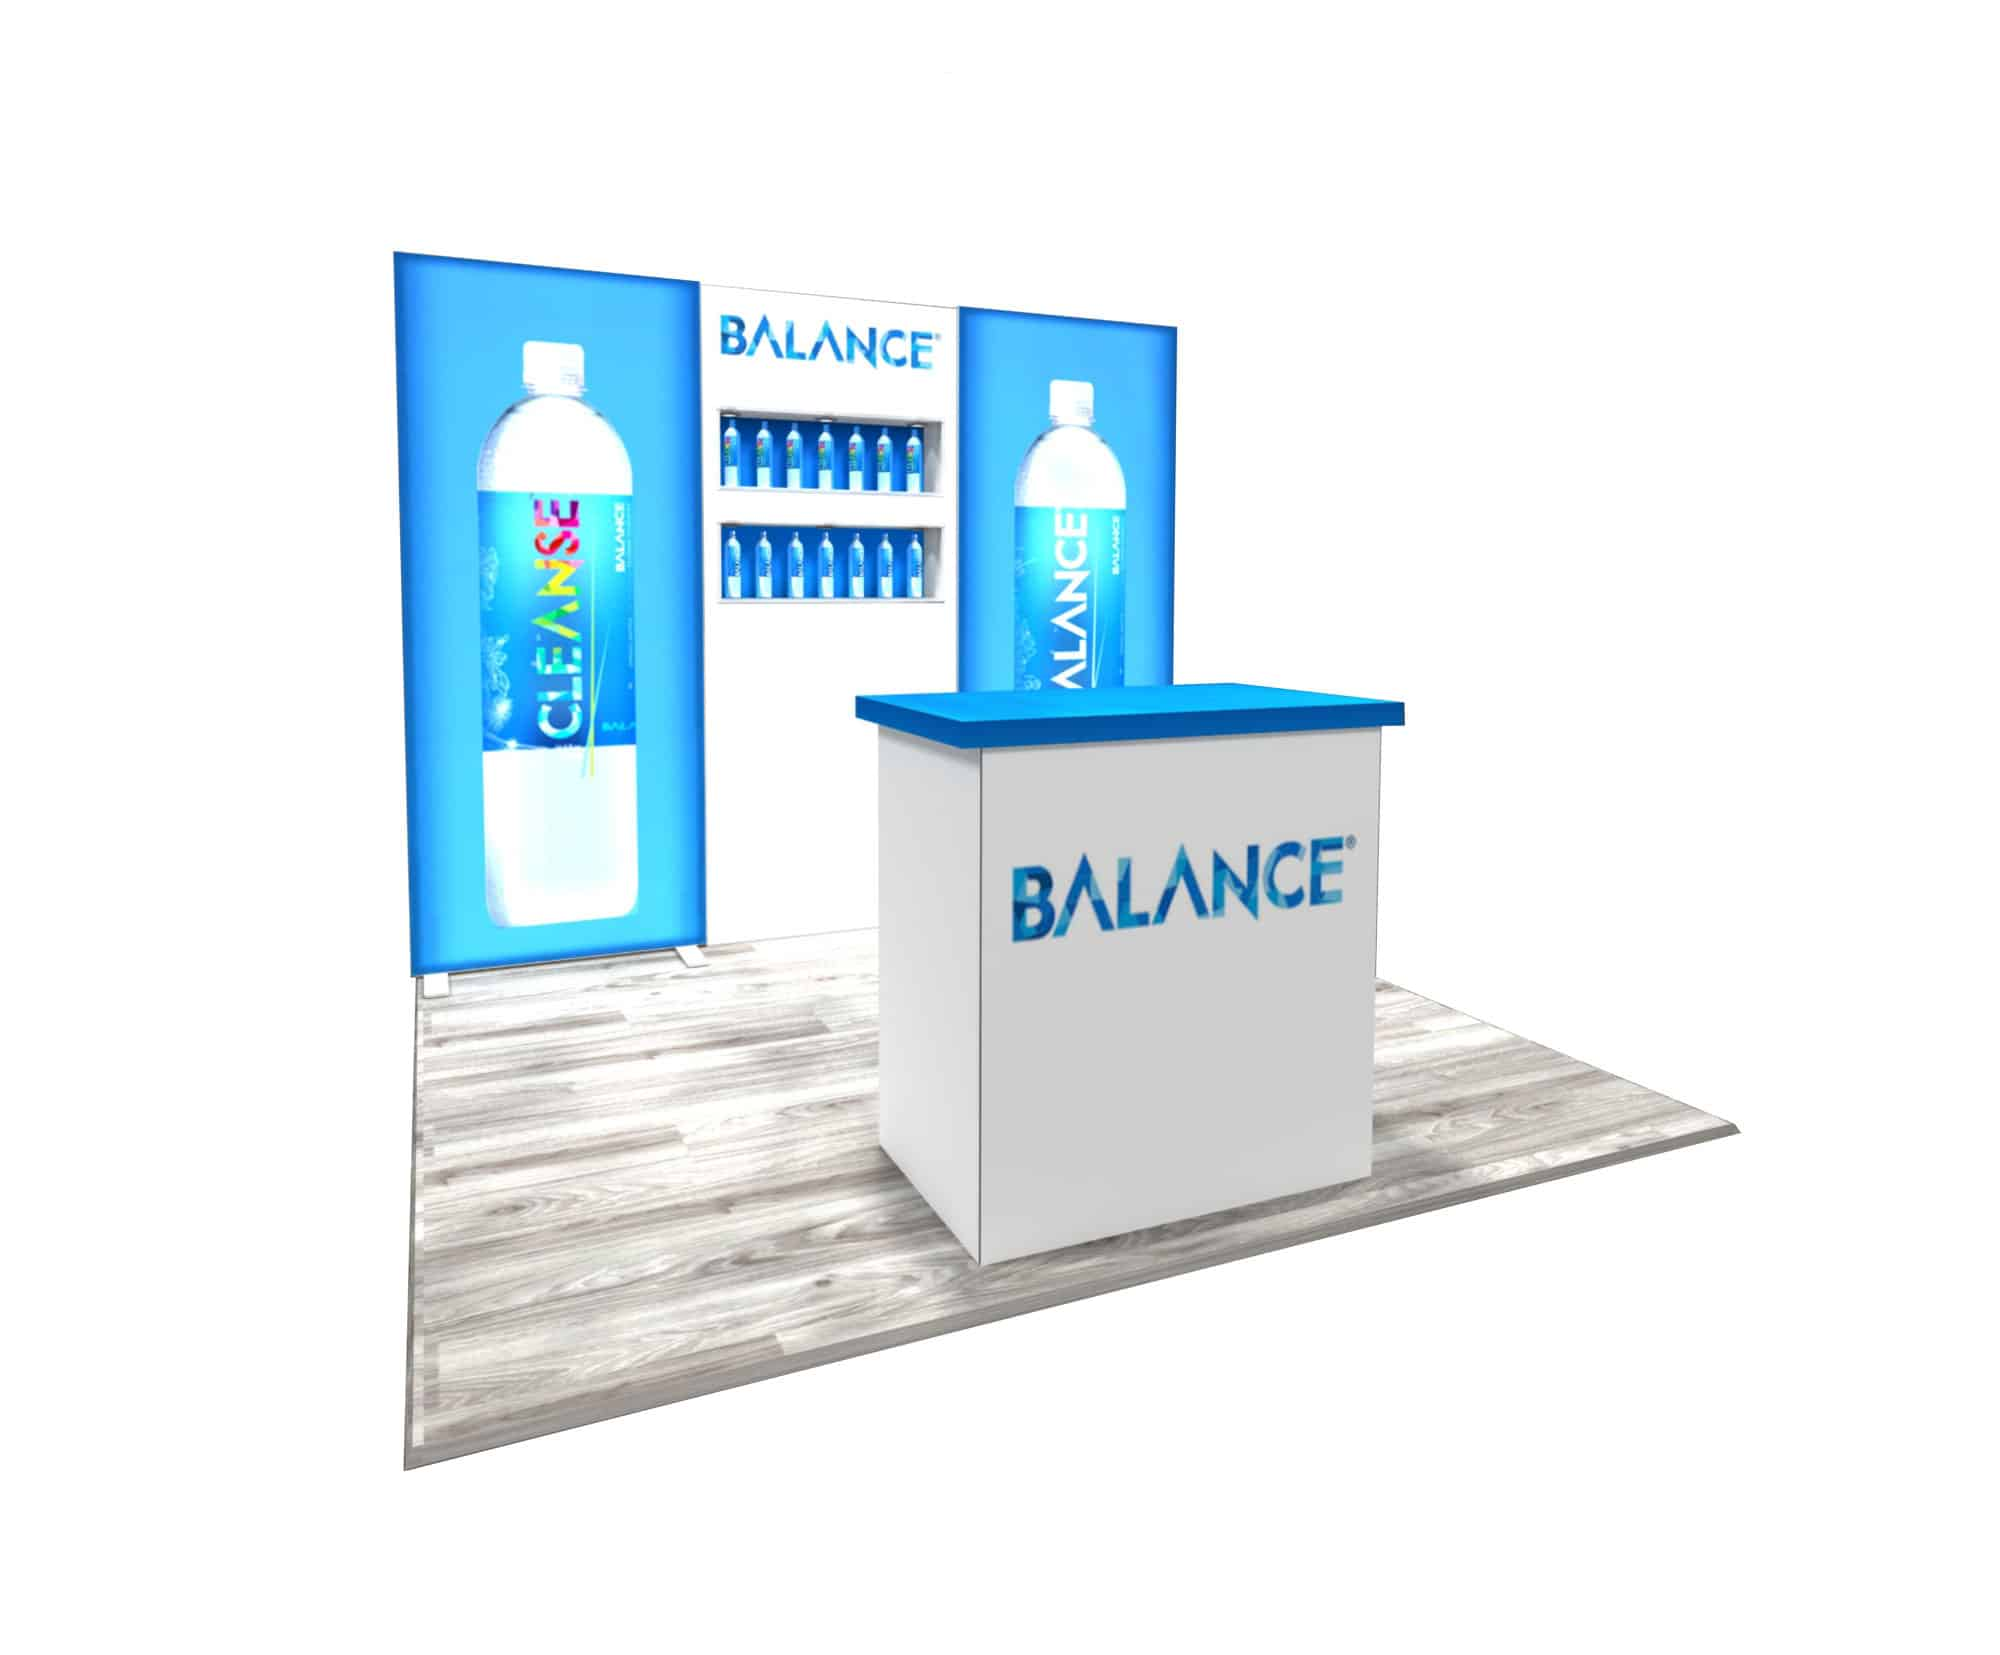 Balance  10x10 Trade Show Booth  Booth Design Ideas